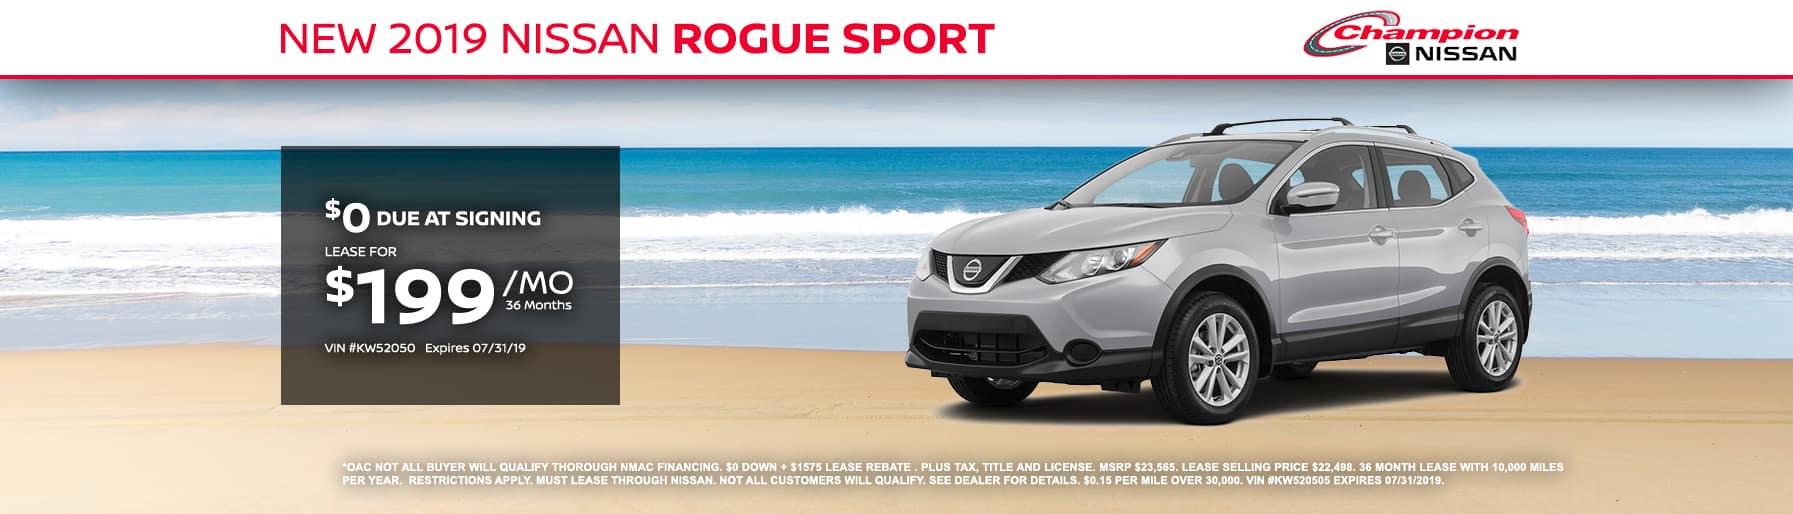 desktop TK 2019 Nissan Rogue S